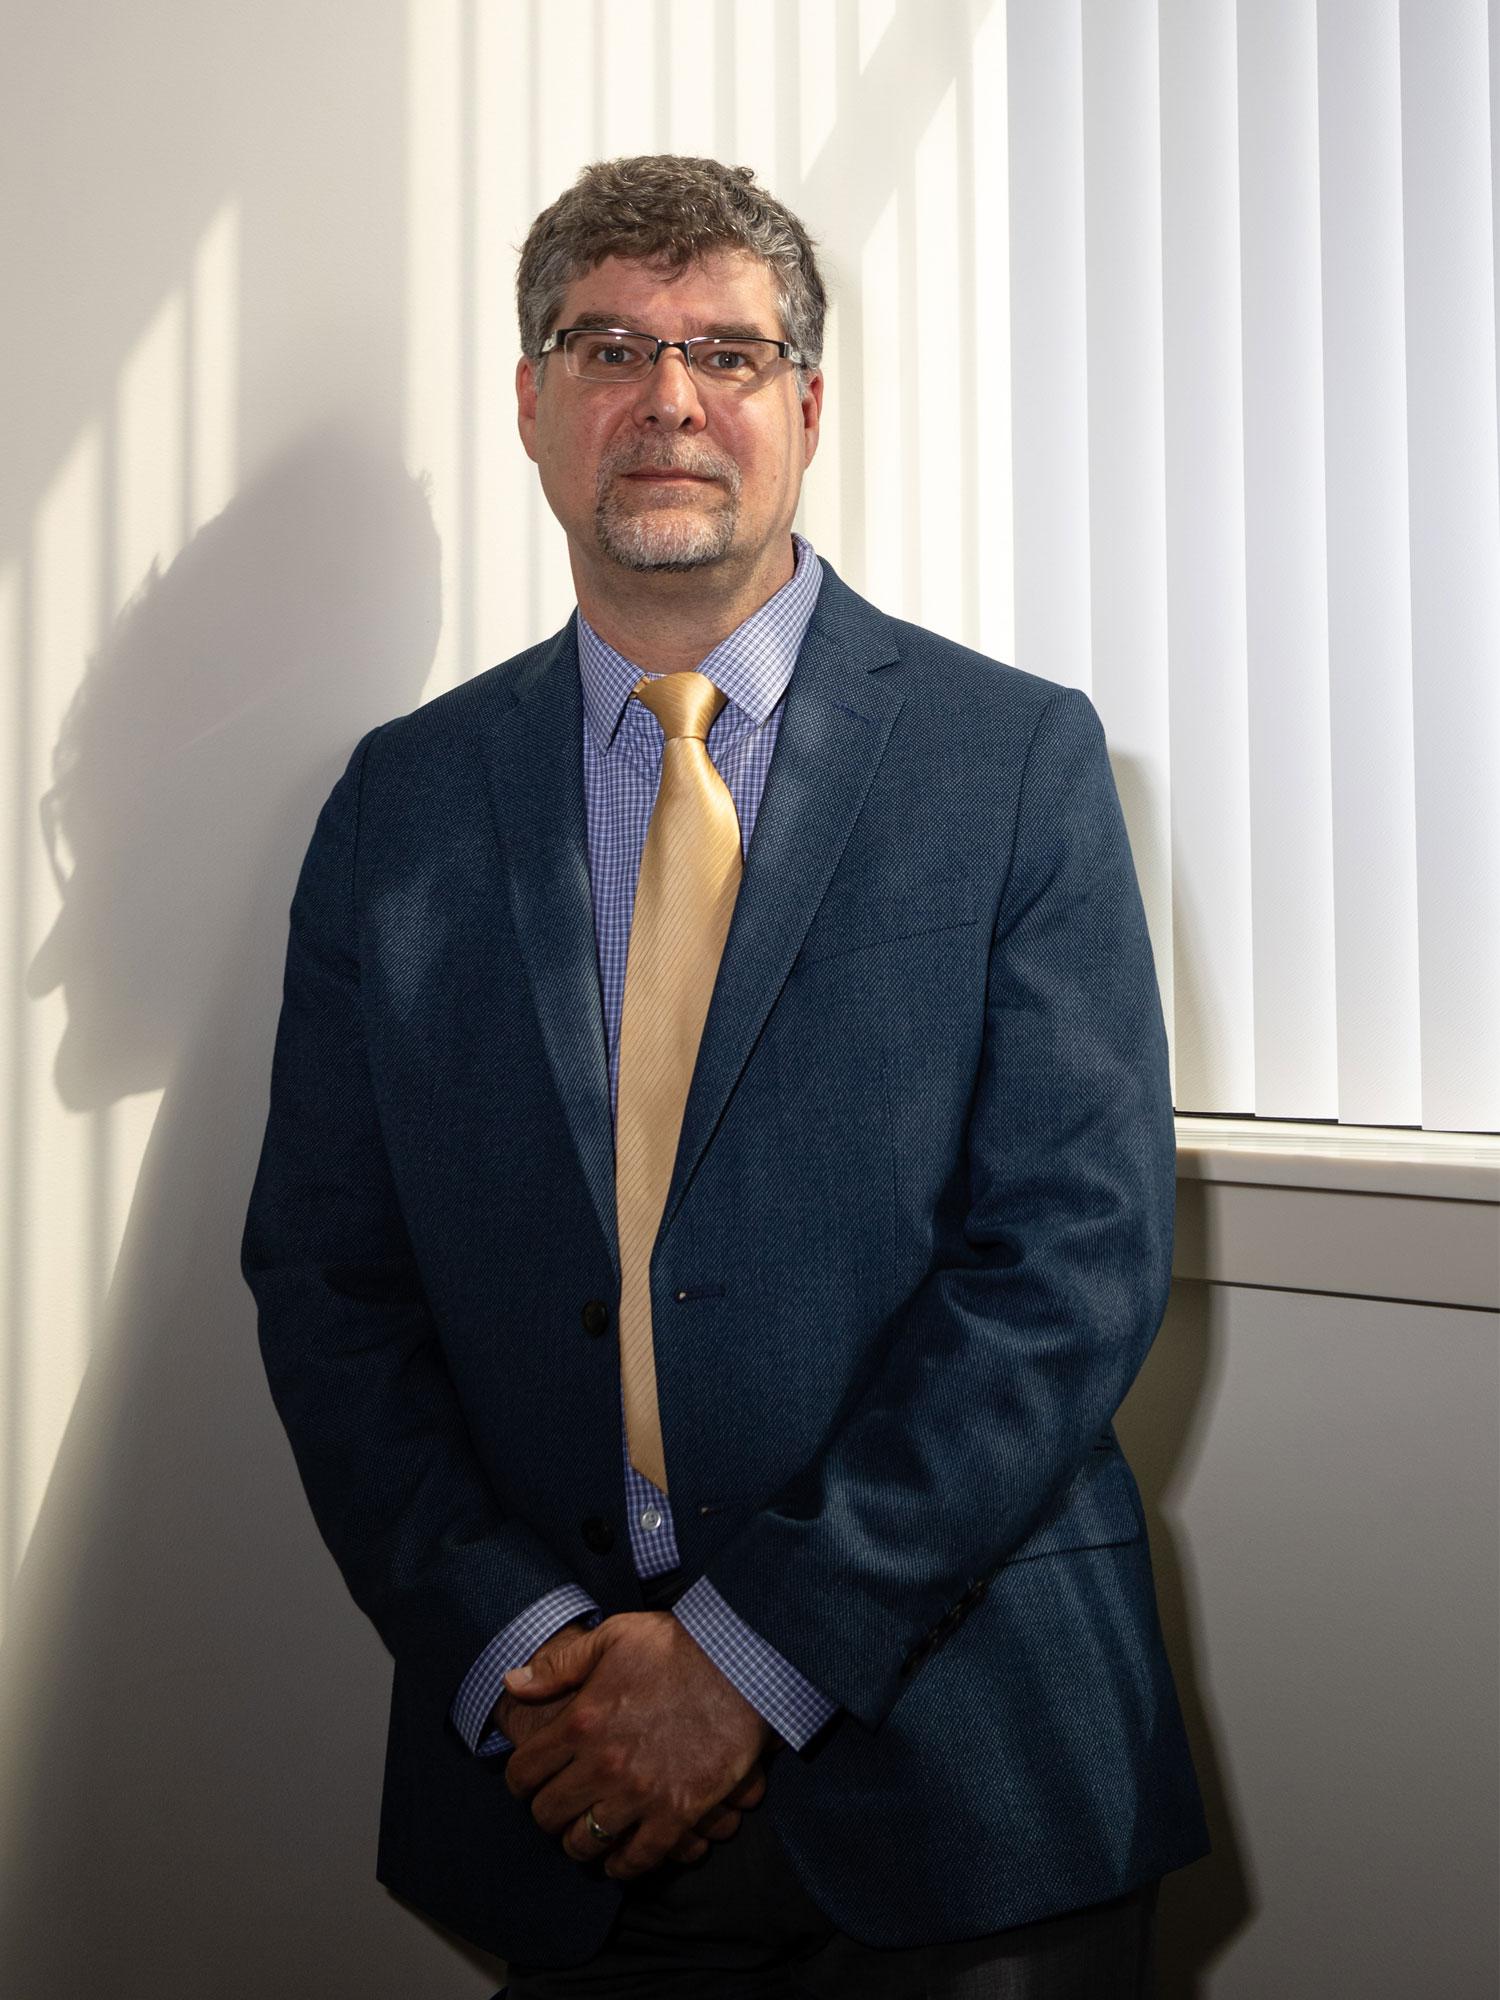 Torsten Hegmann, PhD